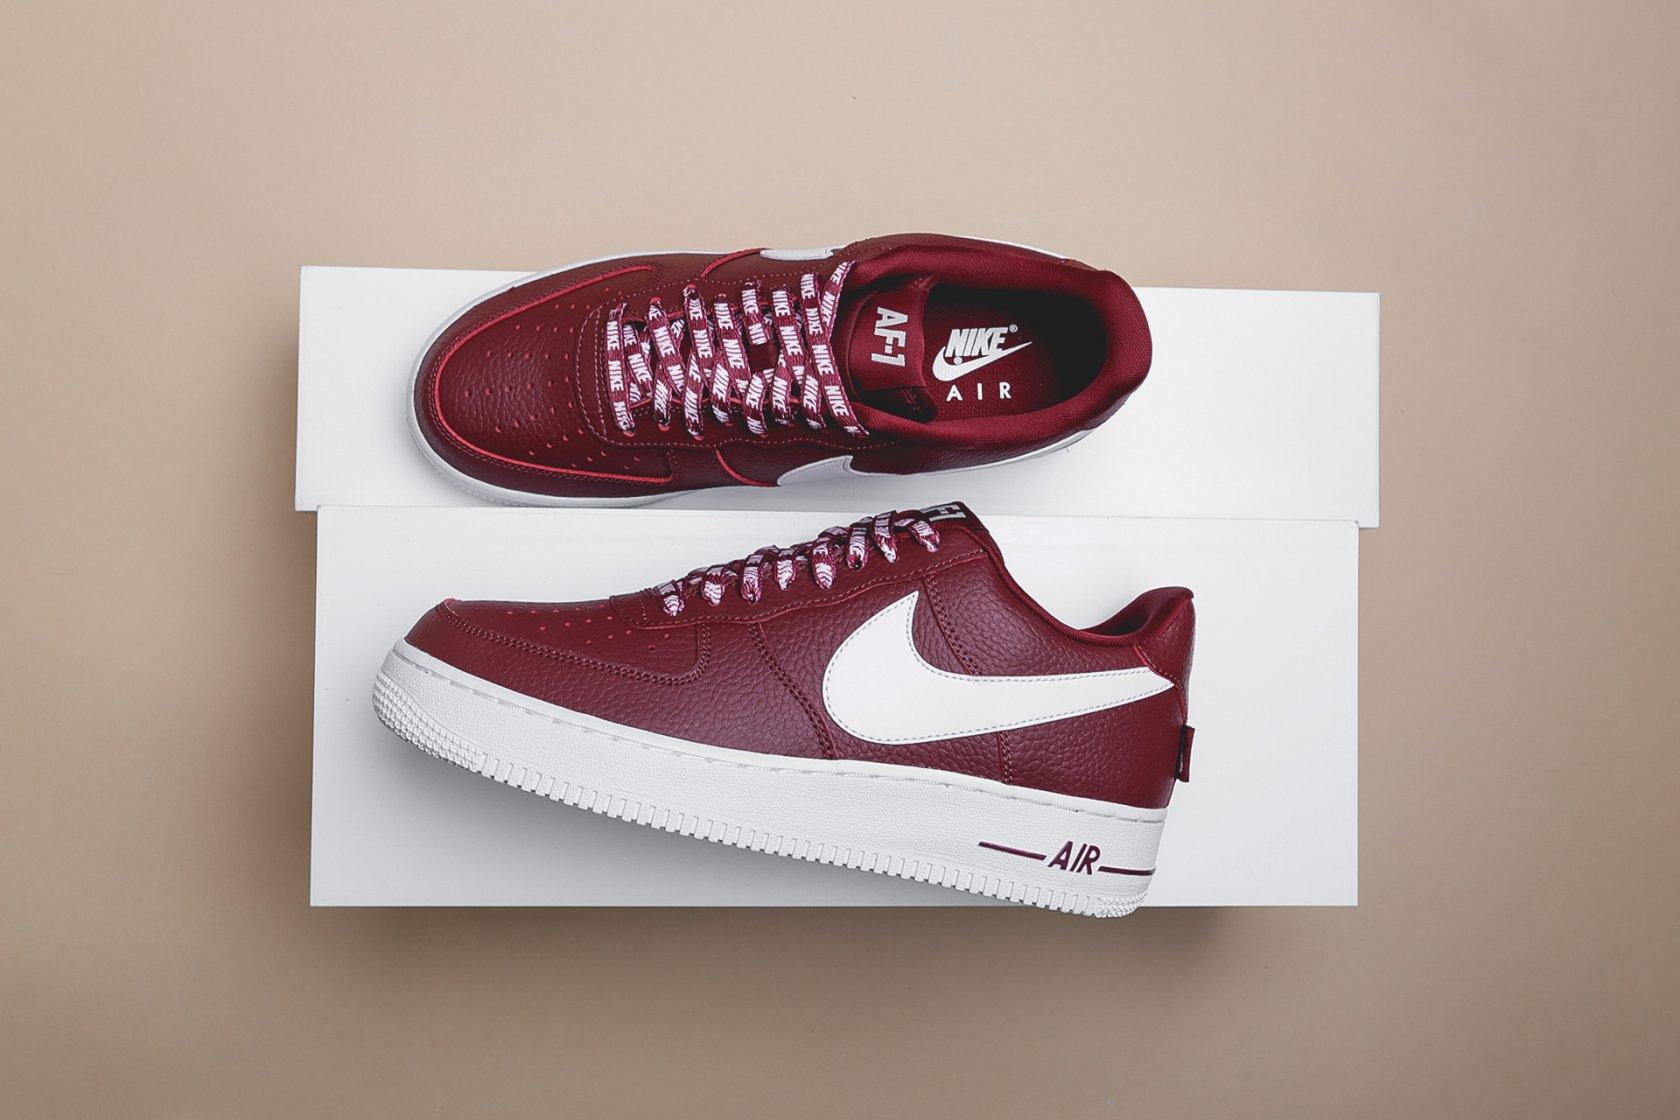 b4426b7a Nike x NBA - Статьи блога интернет магазина Sneakerhead